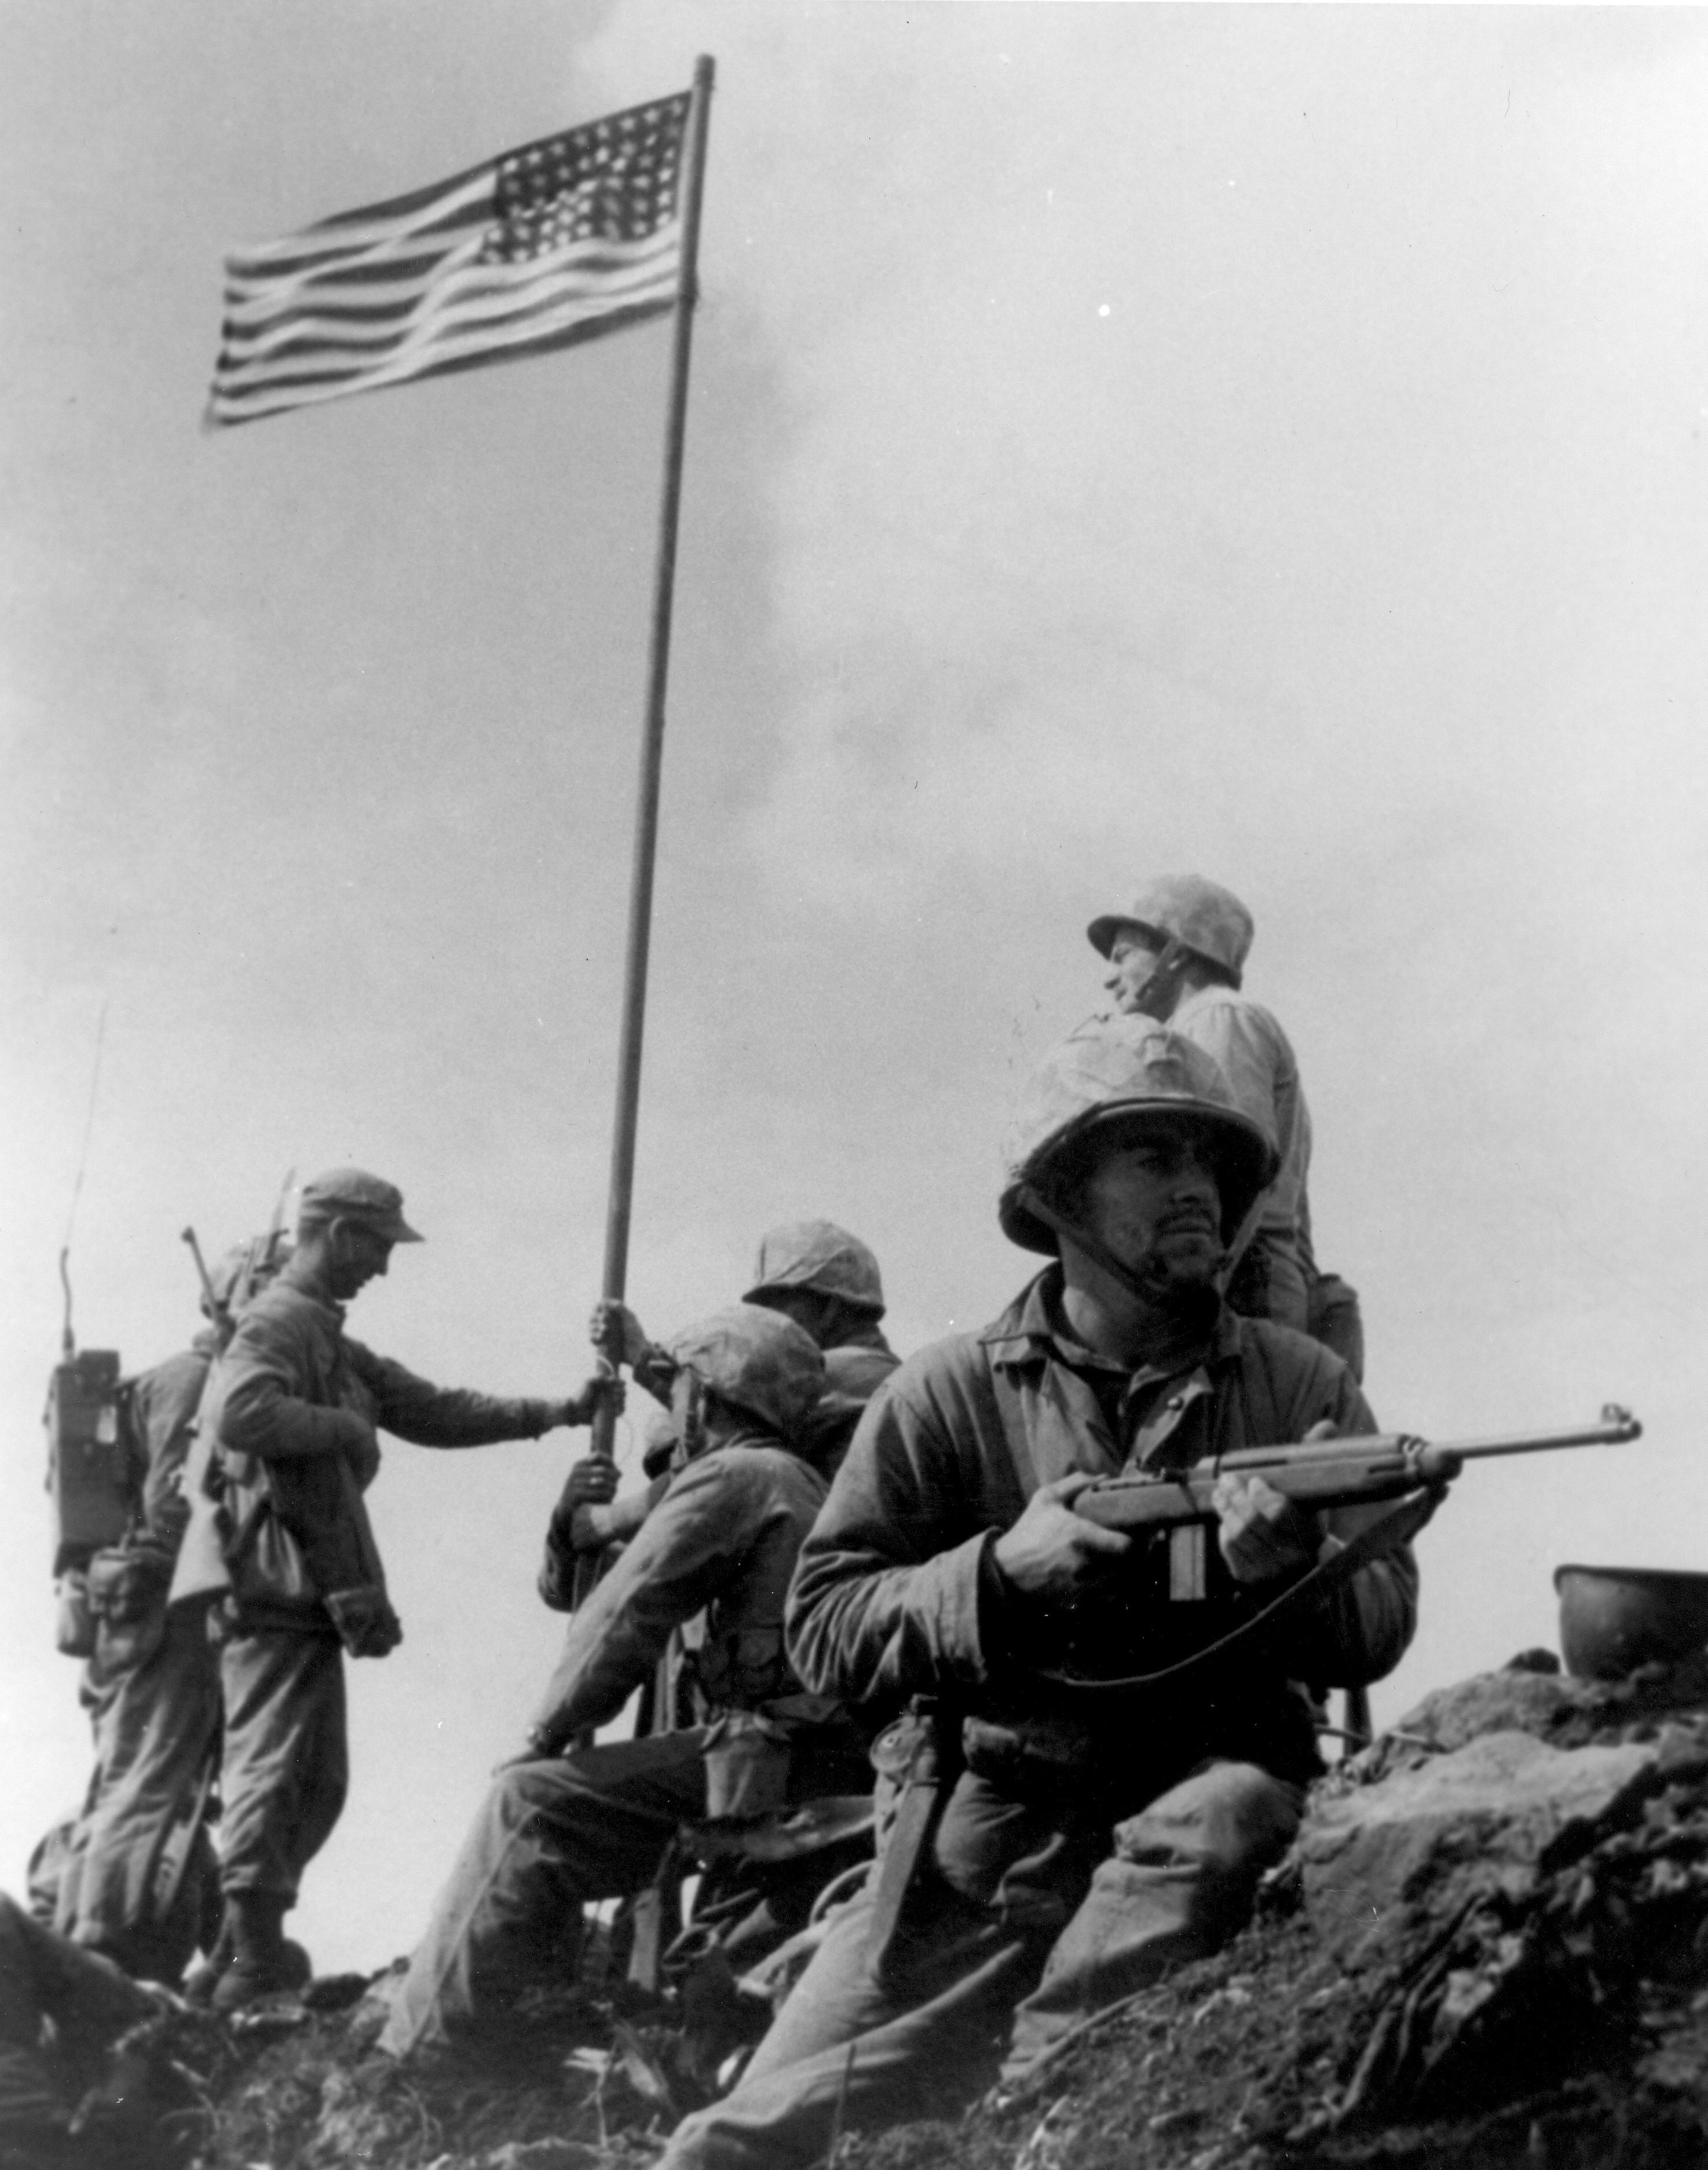 Photo of the first U.S. flag raising on Iwo Jima, taken by Staff Sergeant Louis R. Lowery, USMC, staff photographer for Leatherneck magazine.